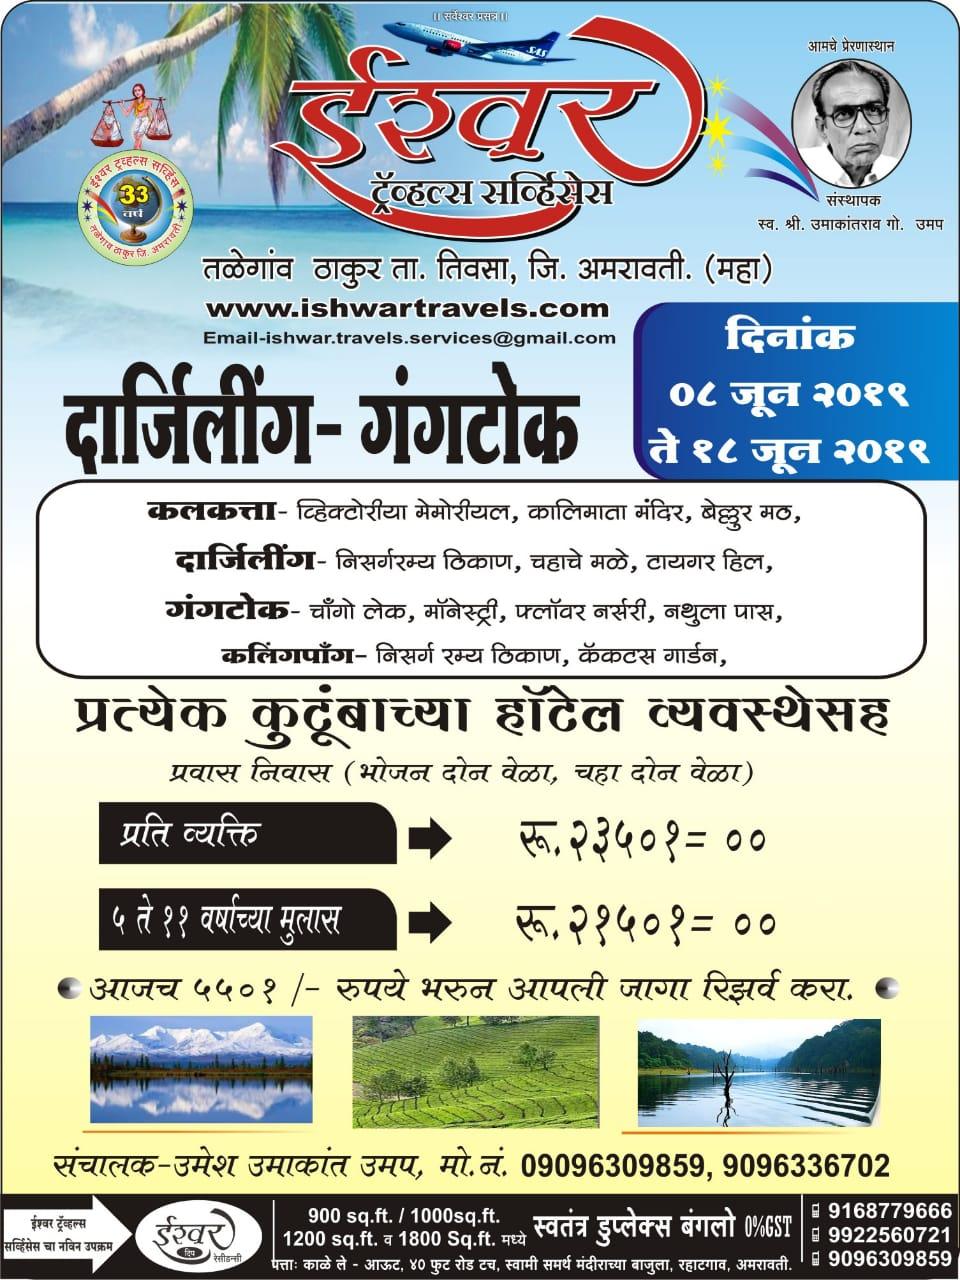 Ishwar Travels Services | Domestic Tours, International